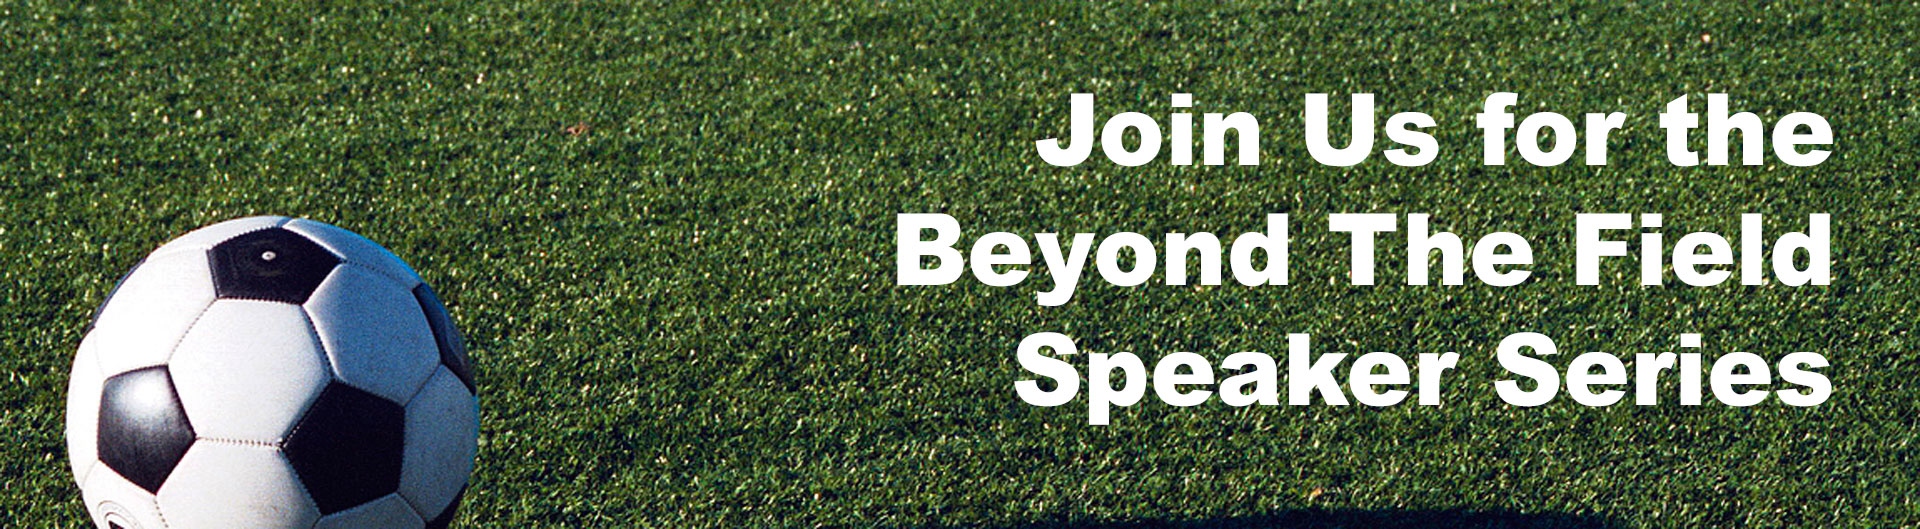 soccer ball in green field promoting speaker series